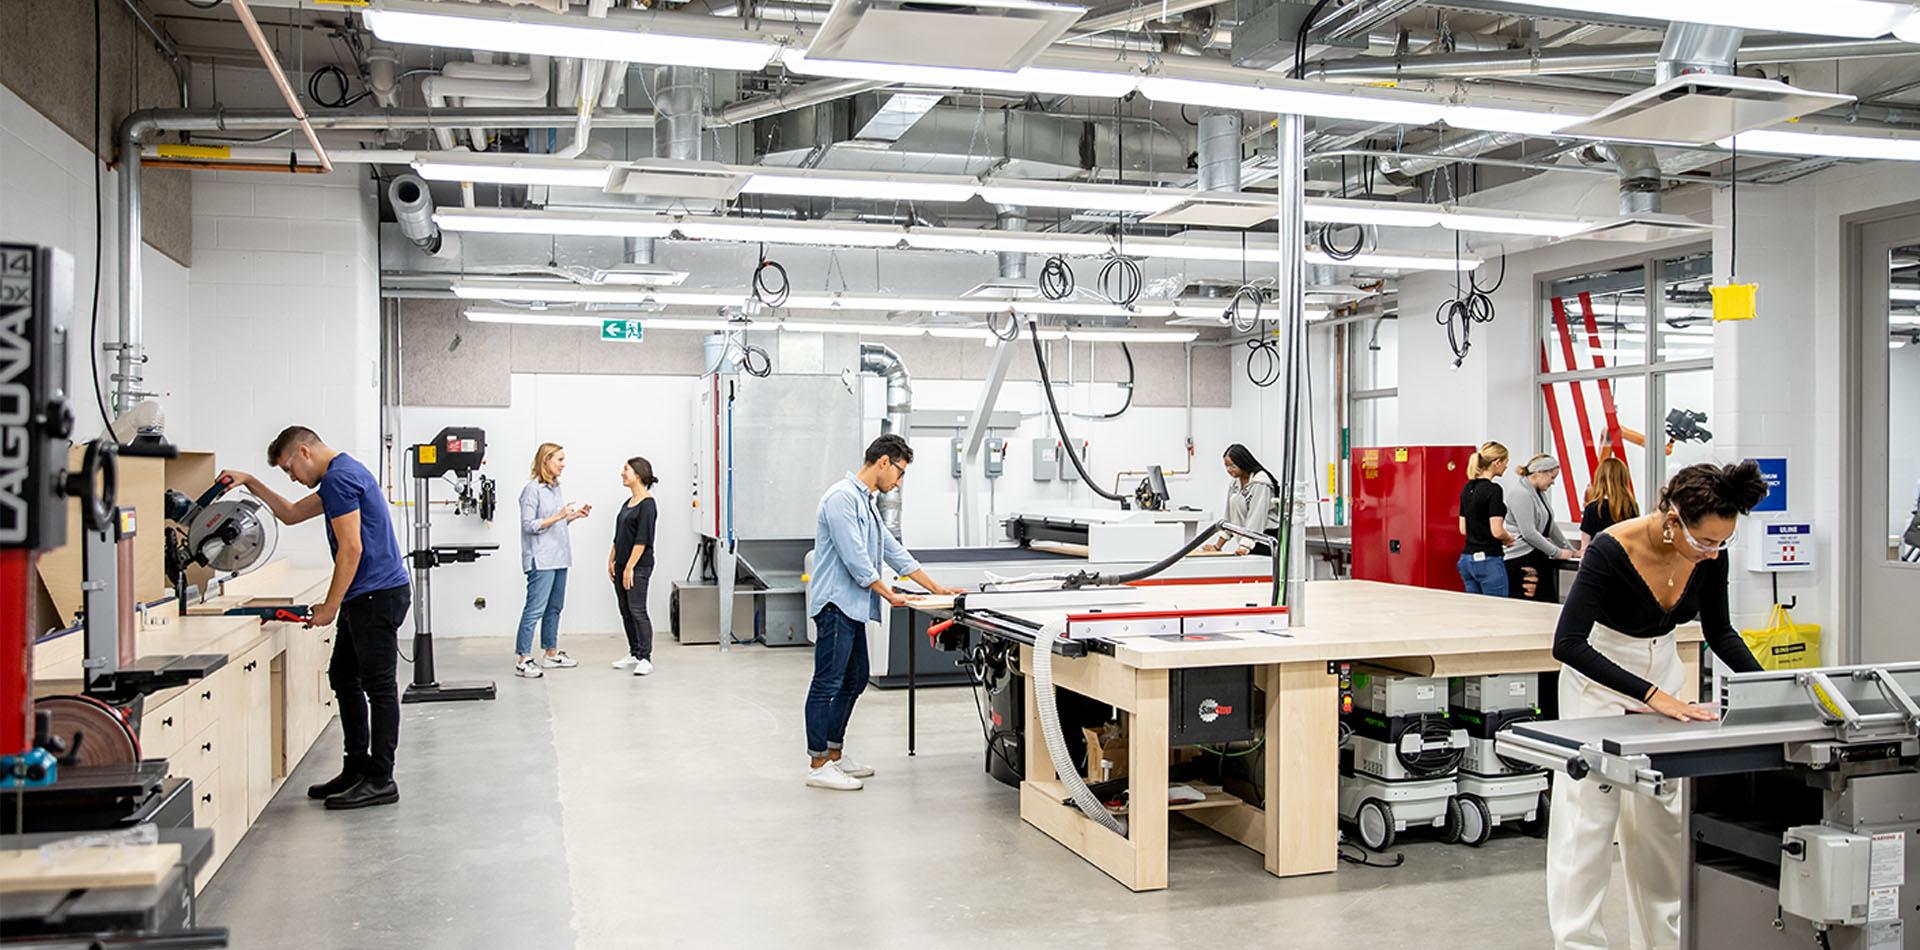 DesignTO Tours: Ryerson Creative Technology Lab